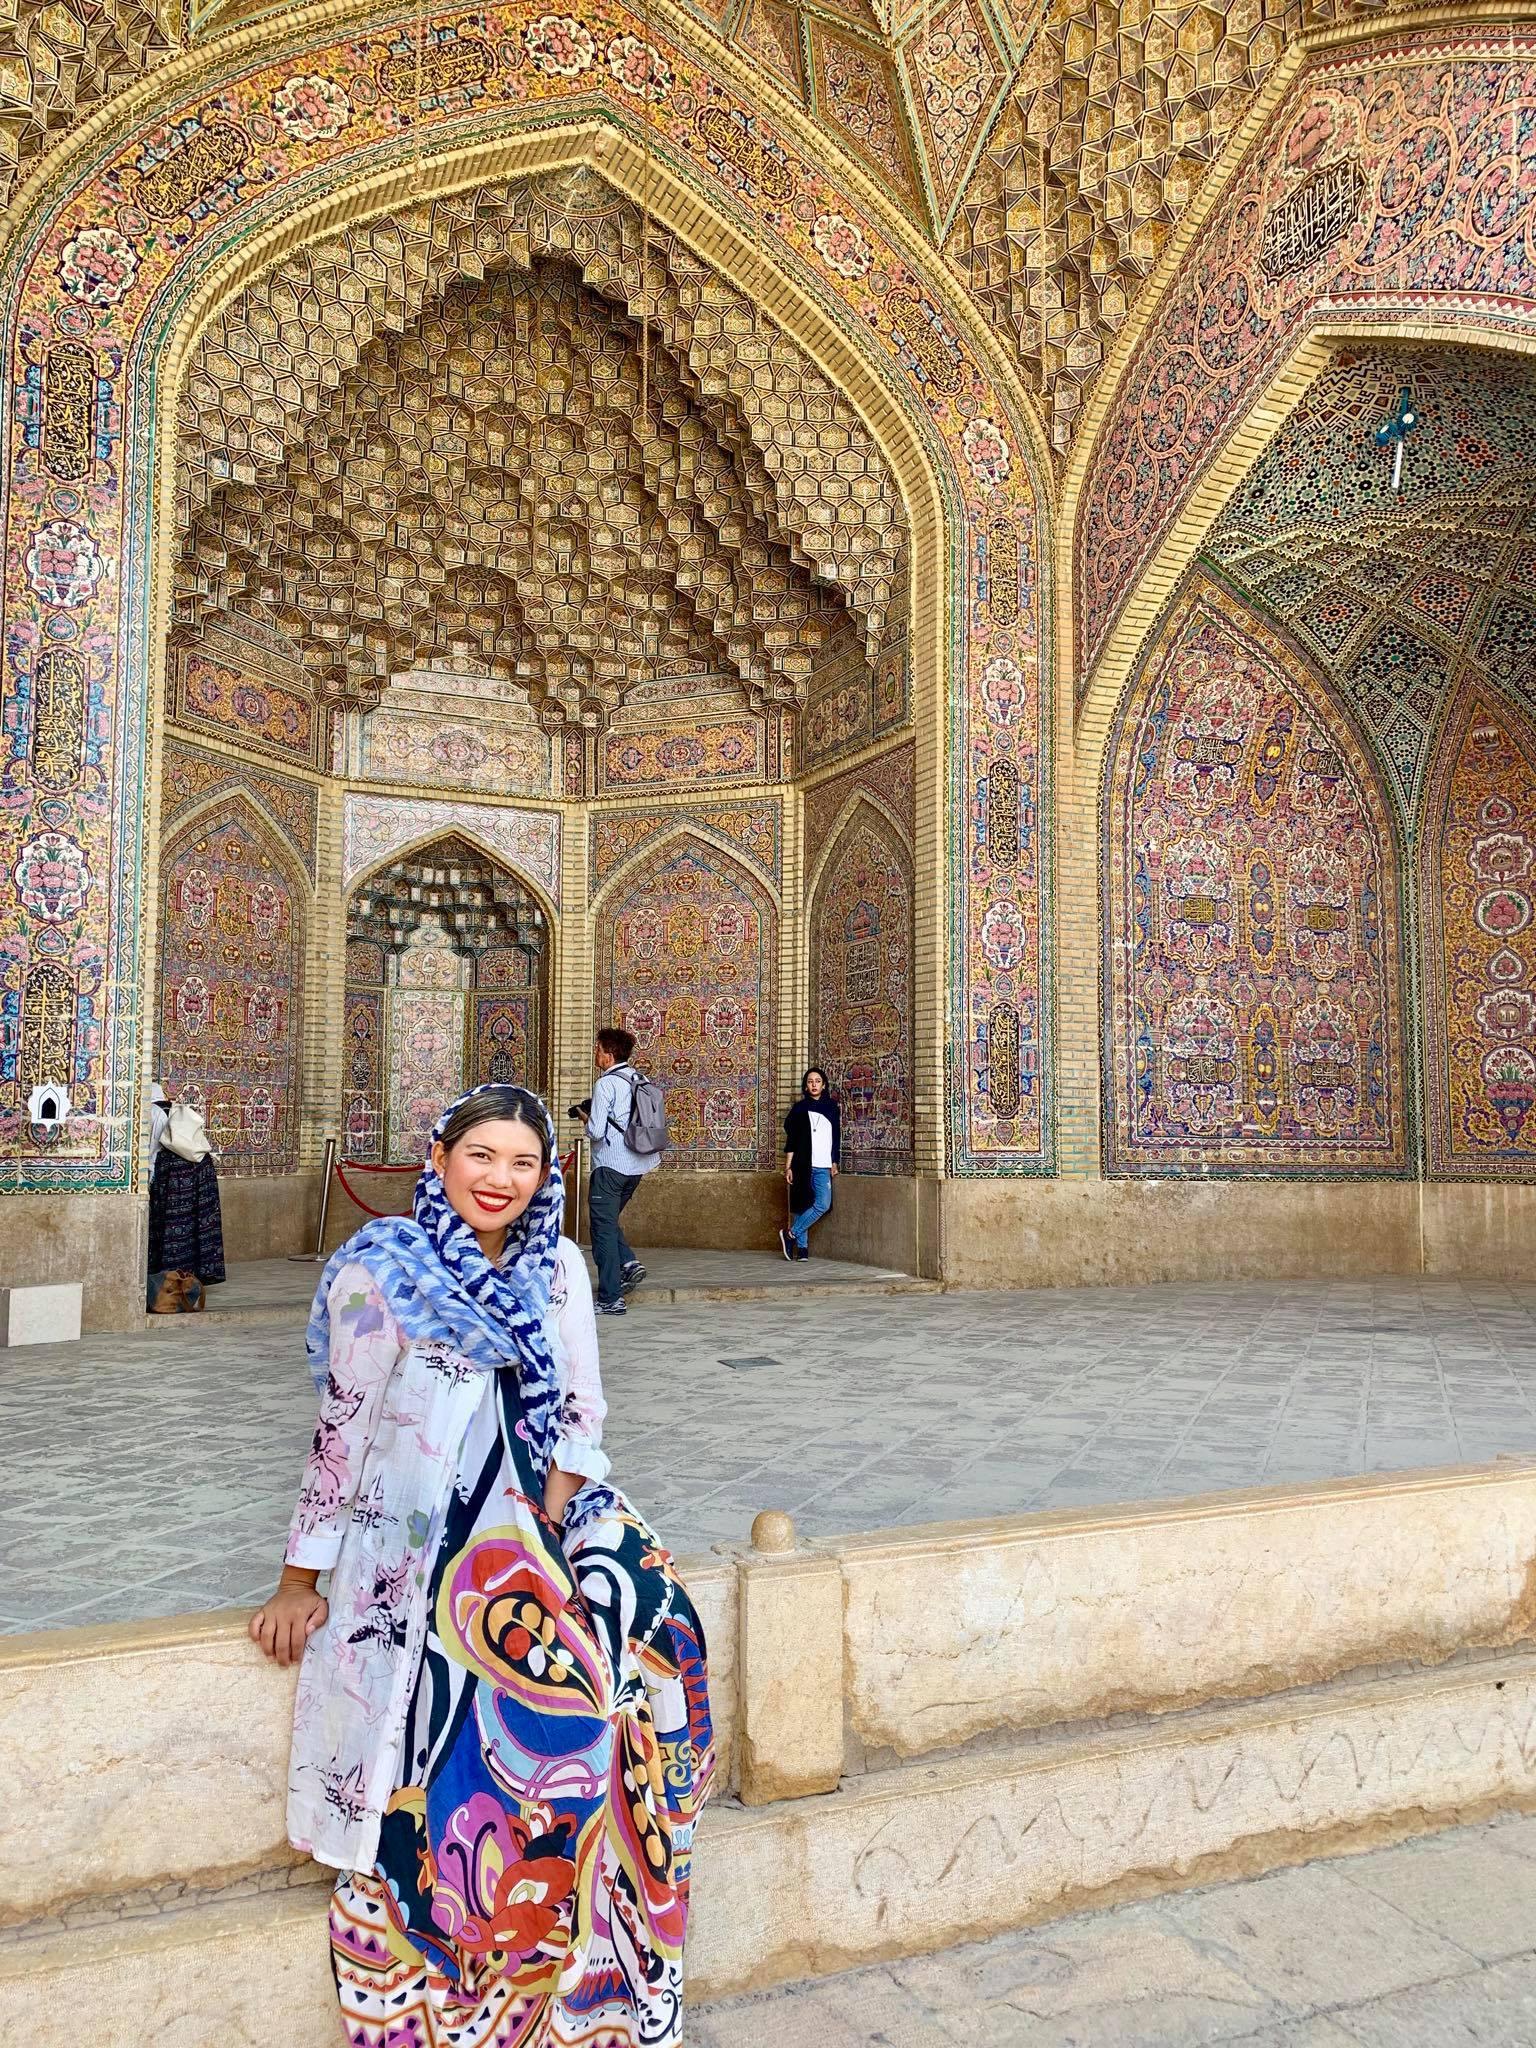 Kach Solo Travels in 2019 Good morning from SHIRAZ, IRAN6.jpg